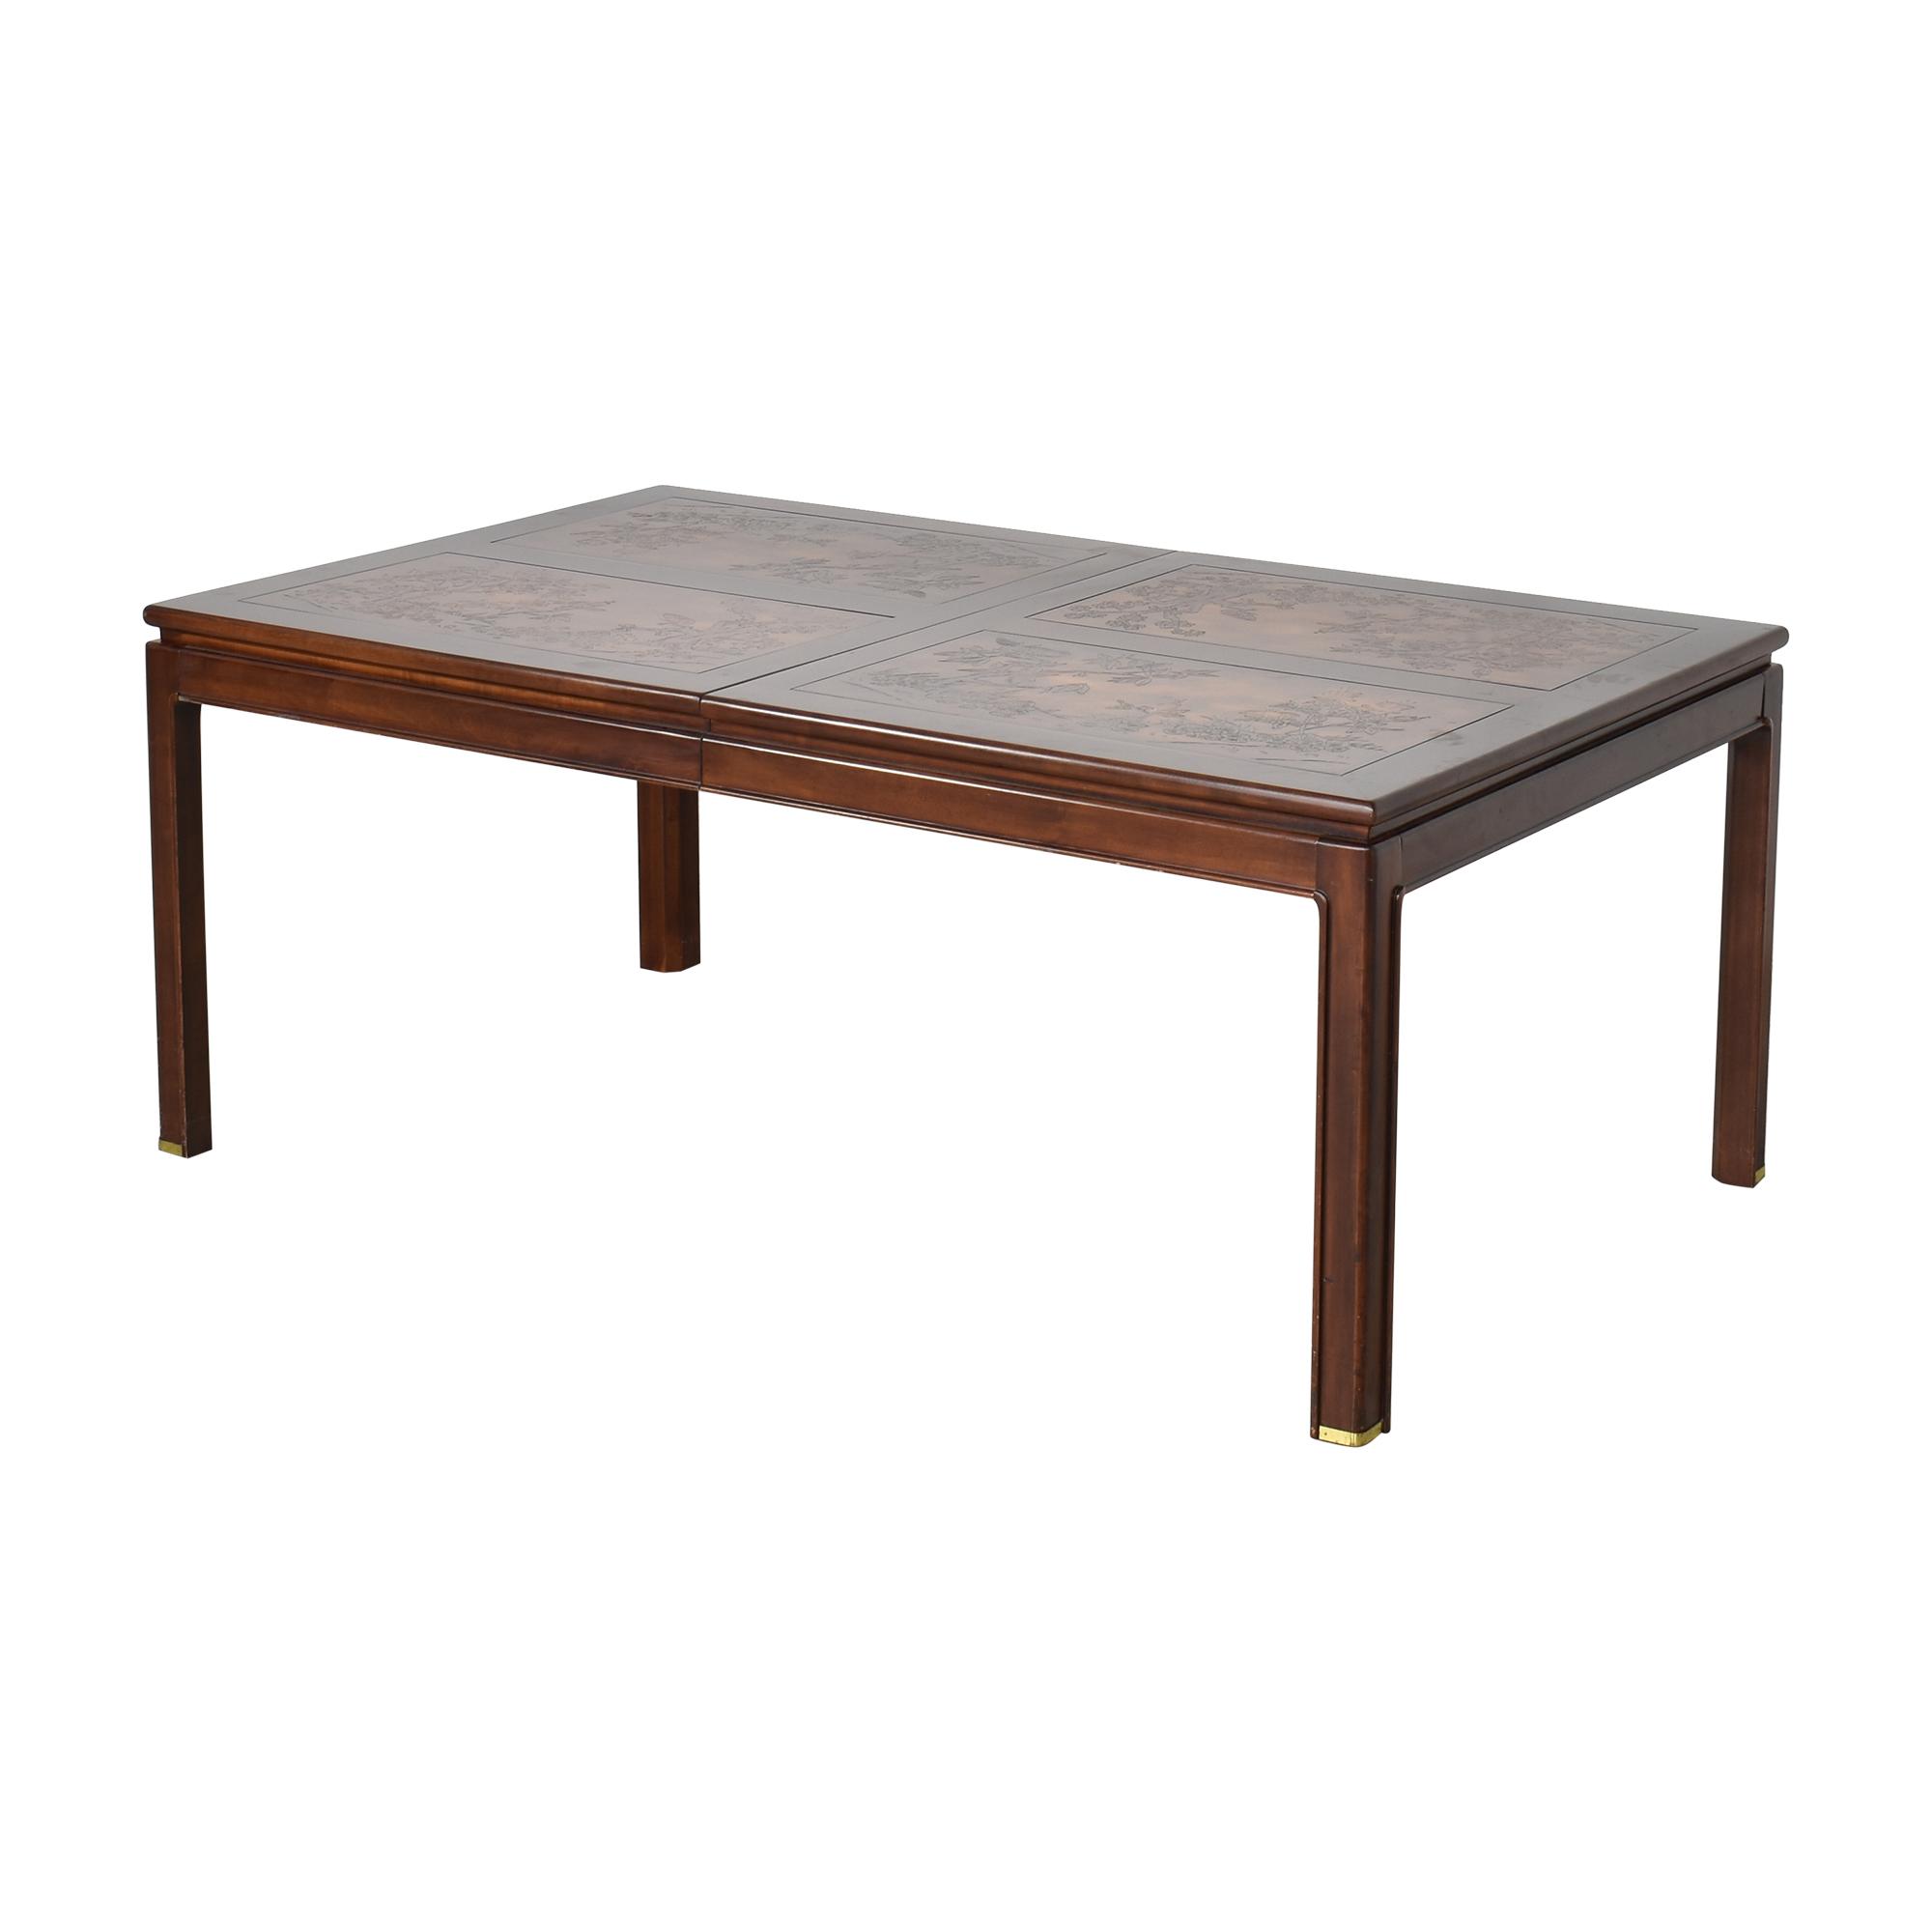 Bernhardt Bernhardt Extendable Dining Table price